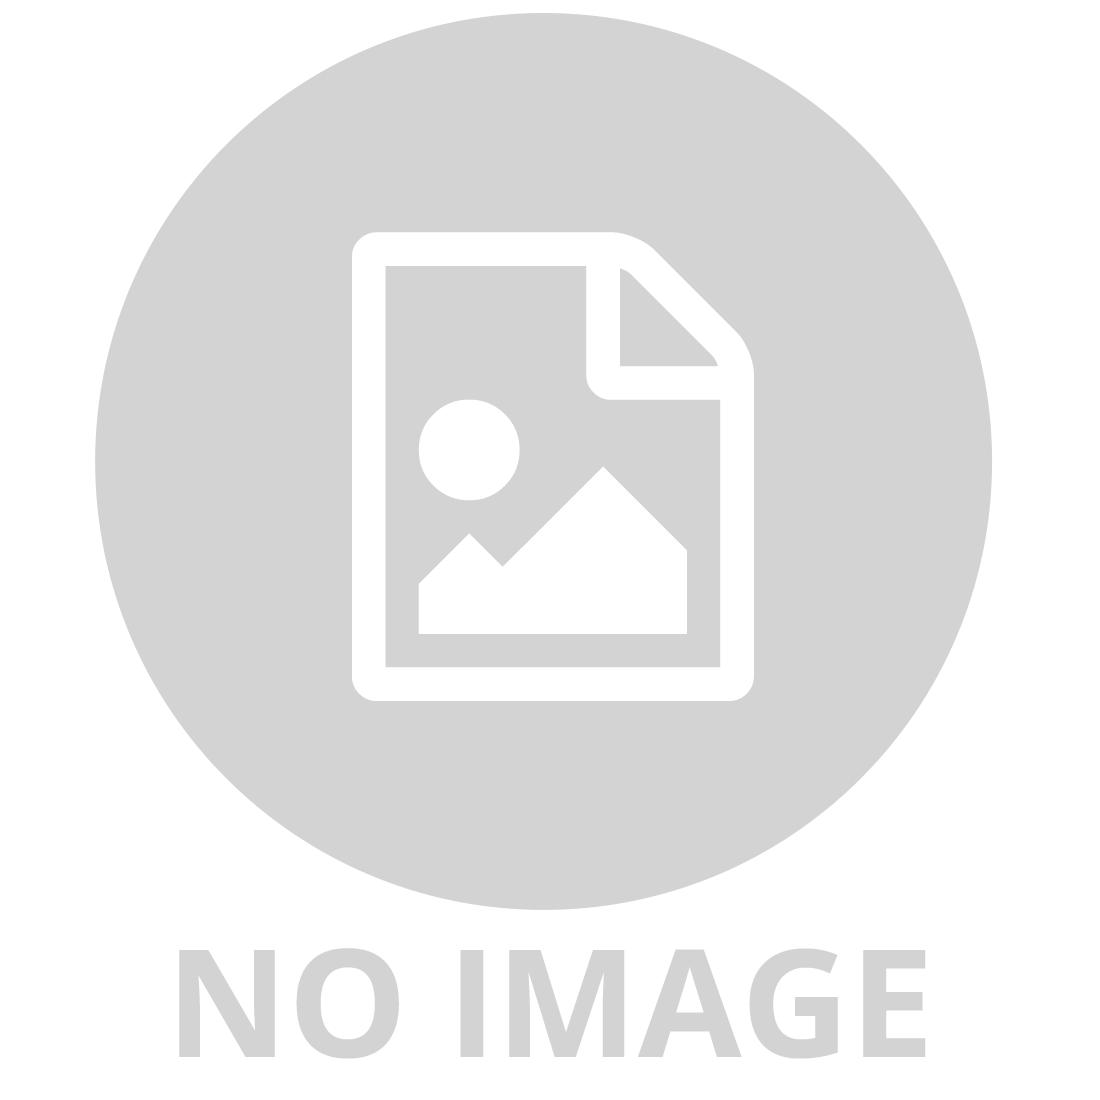 RAVENSBURGER- ROMANTIC SUNSET PUZZLE 750PCE LARGE FORMAT